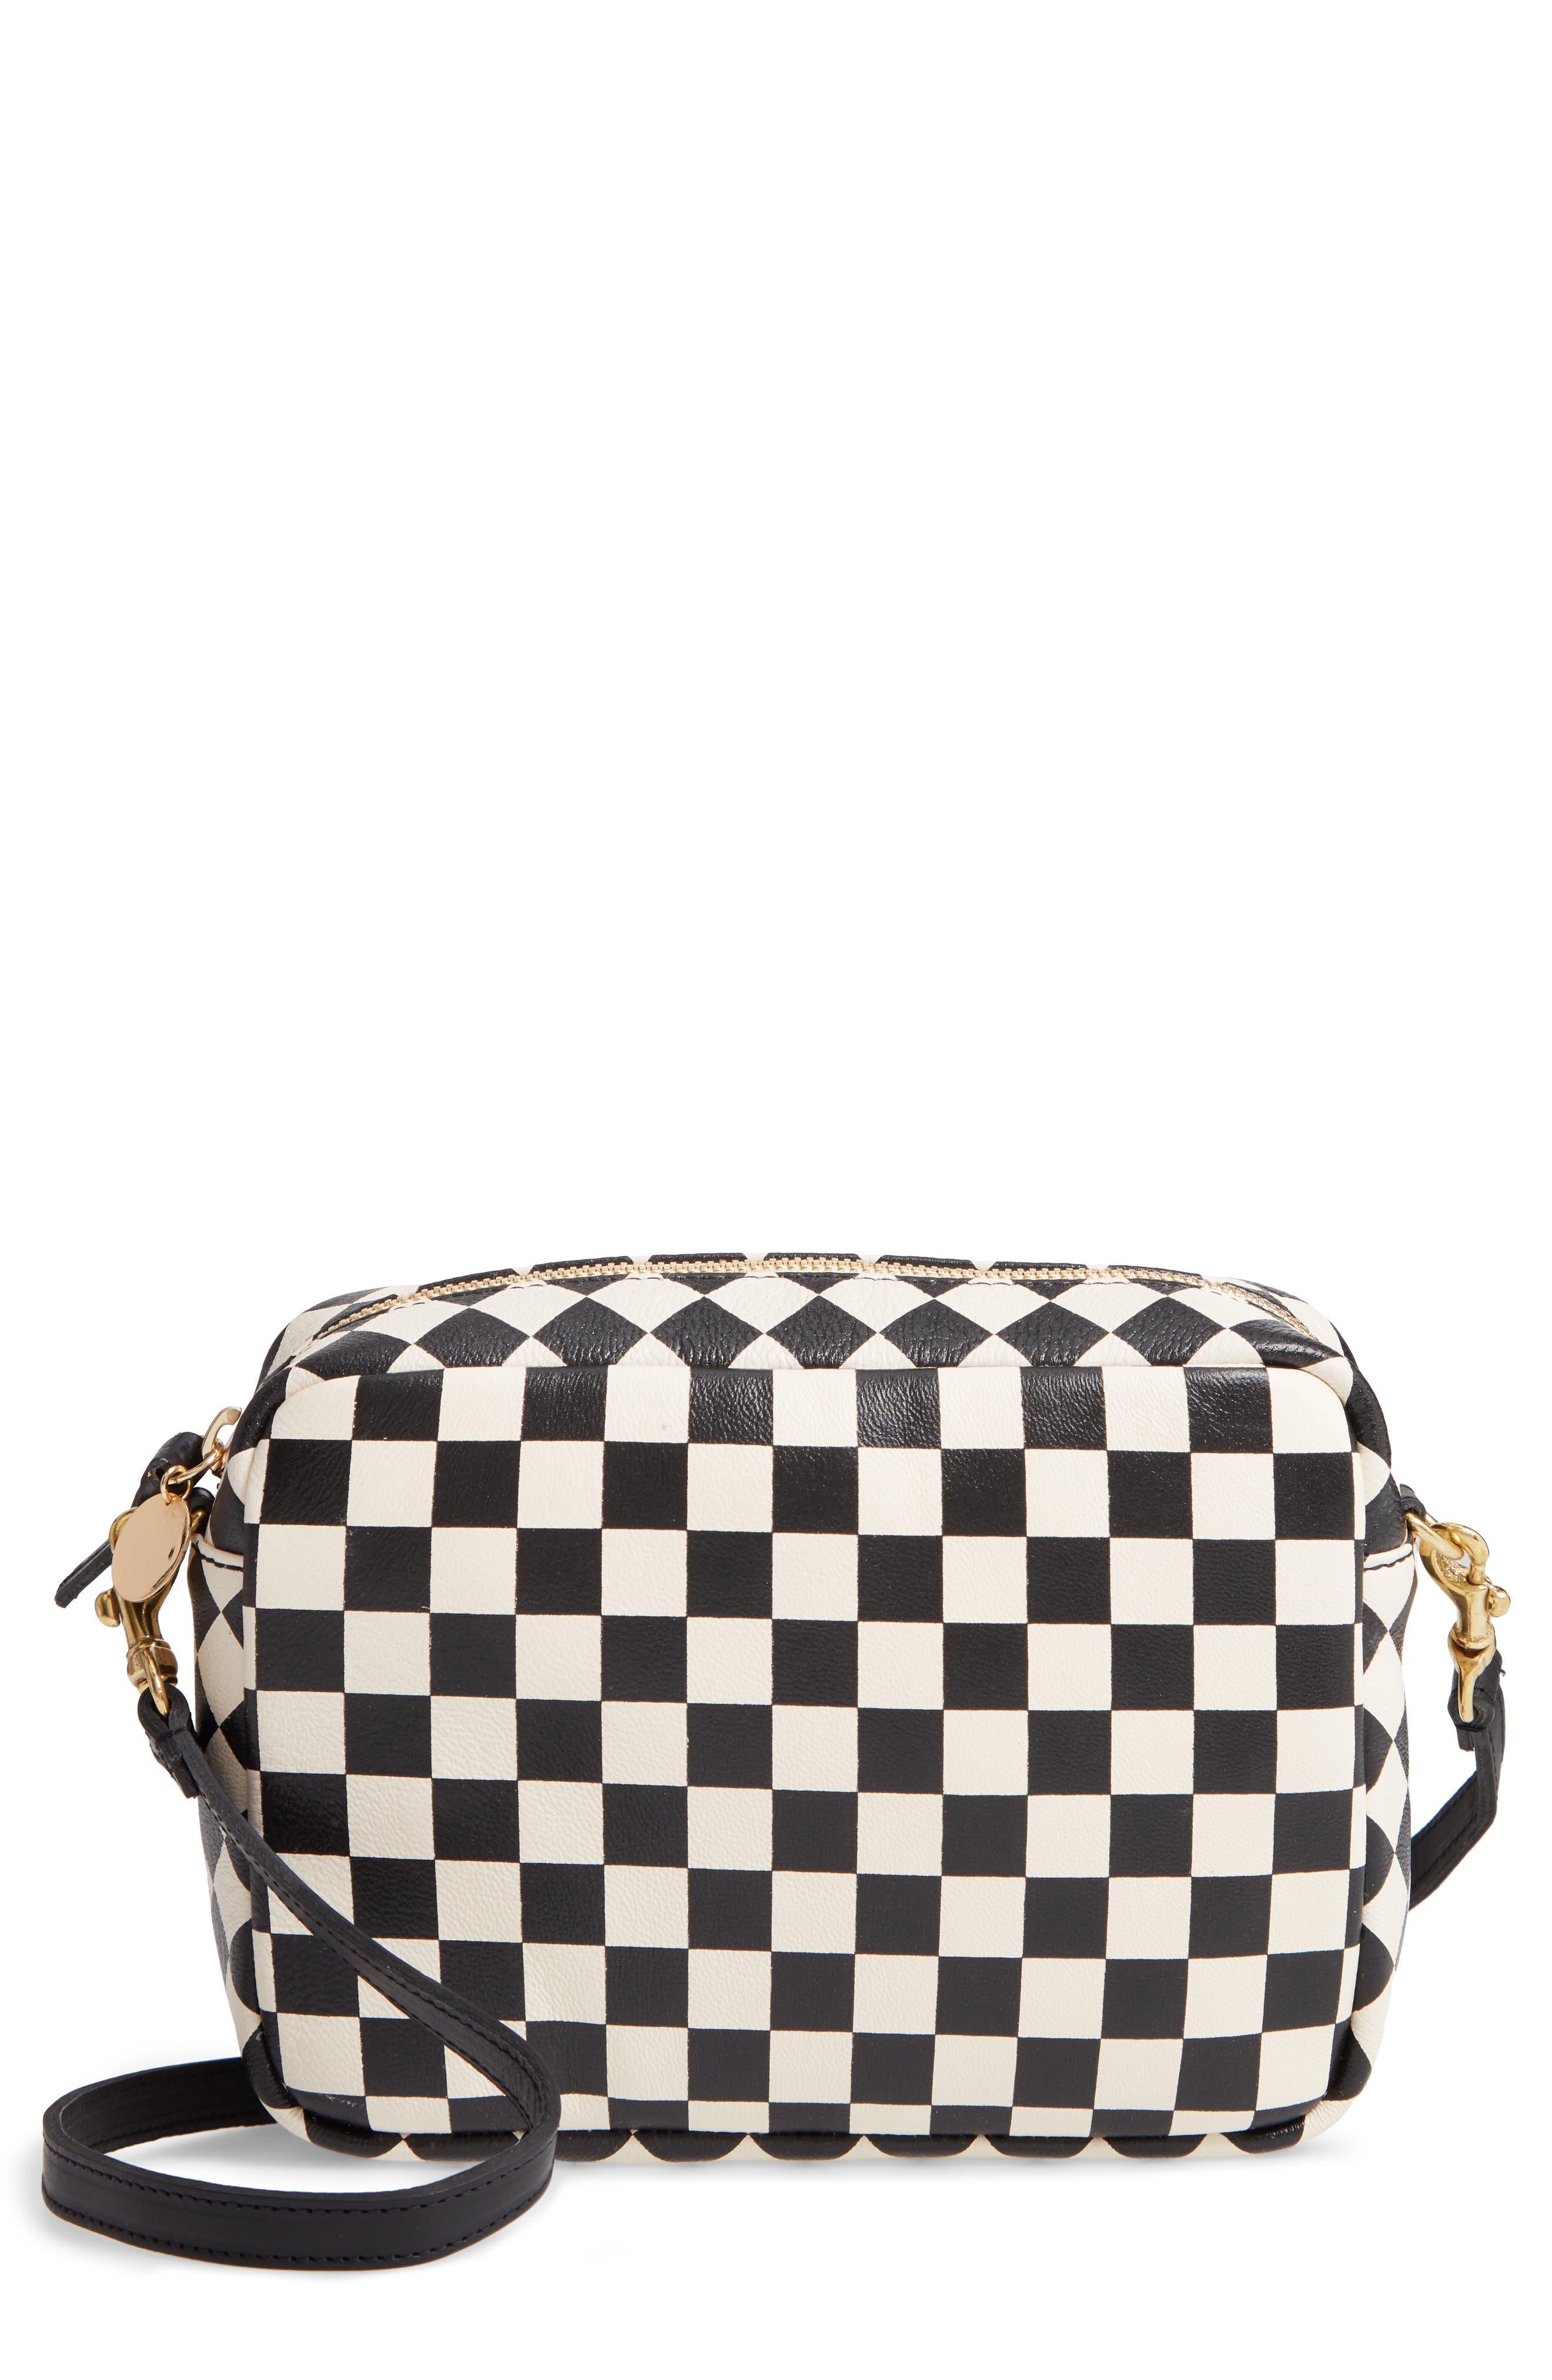 Midi Sac Check Leather Shoulder Bag,                         Main,                         color, CREAM/ BLACK CHECKERS